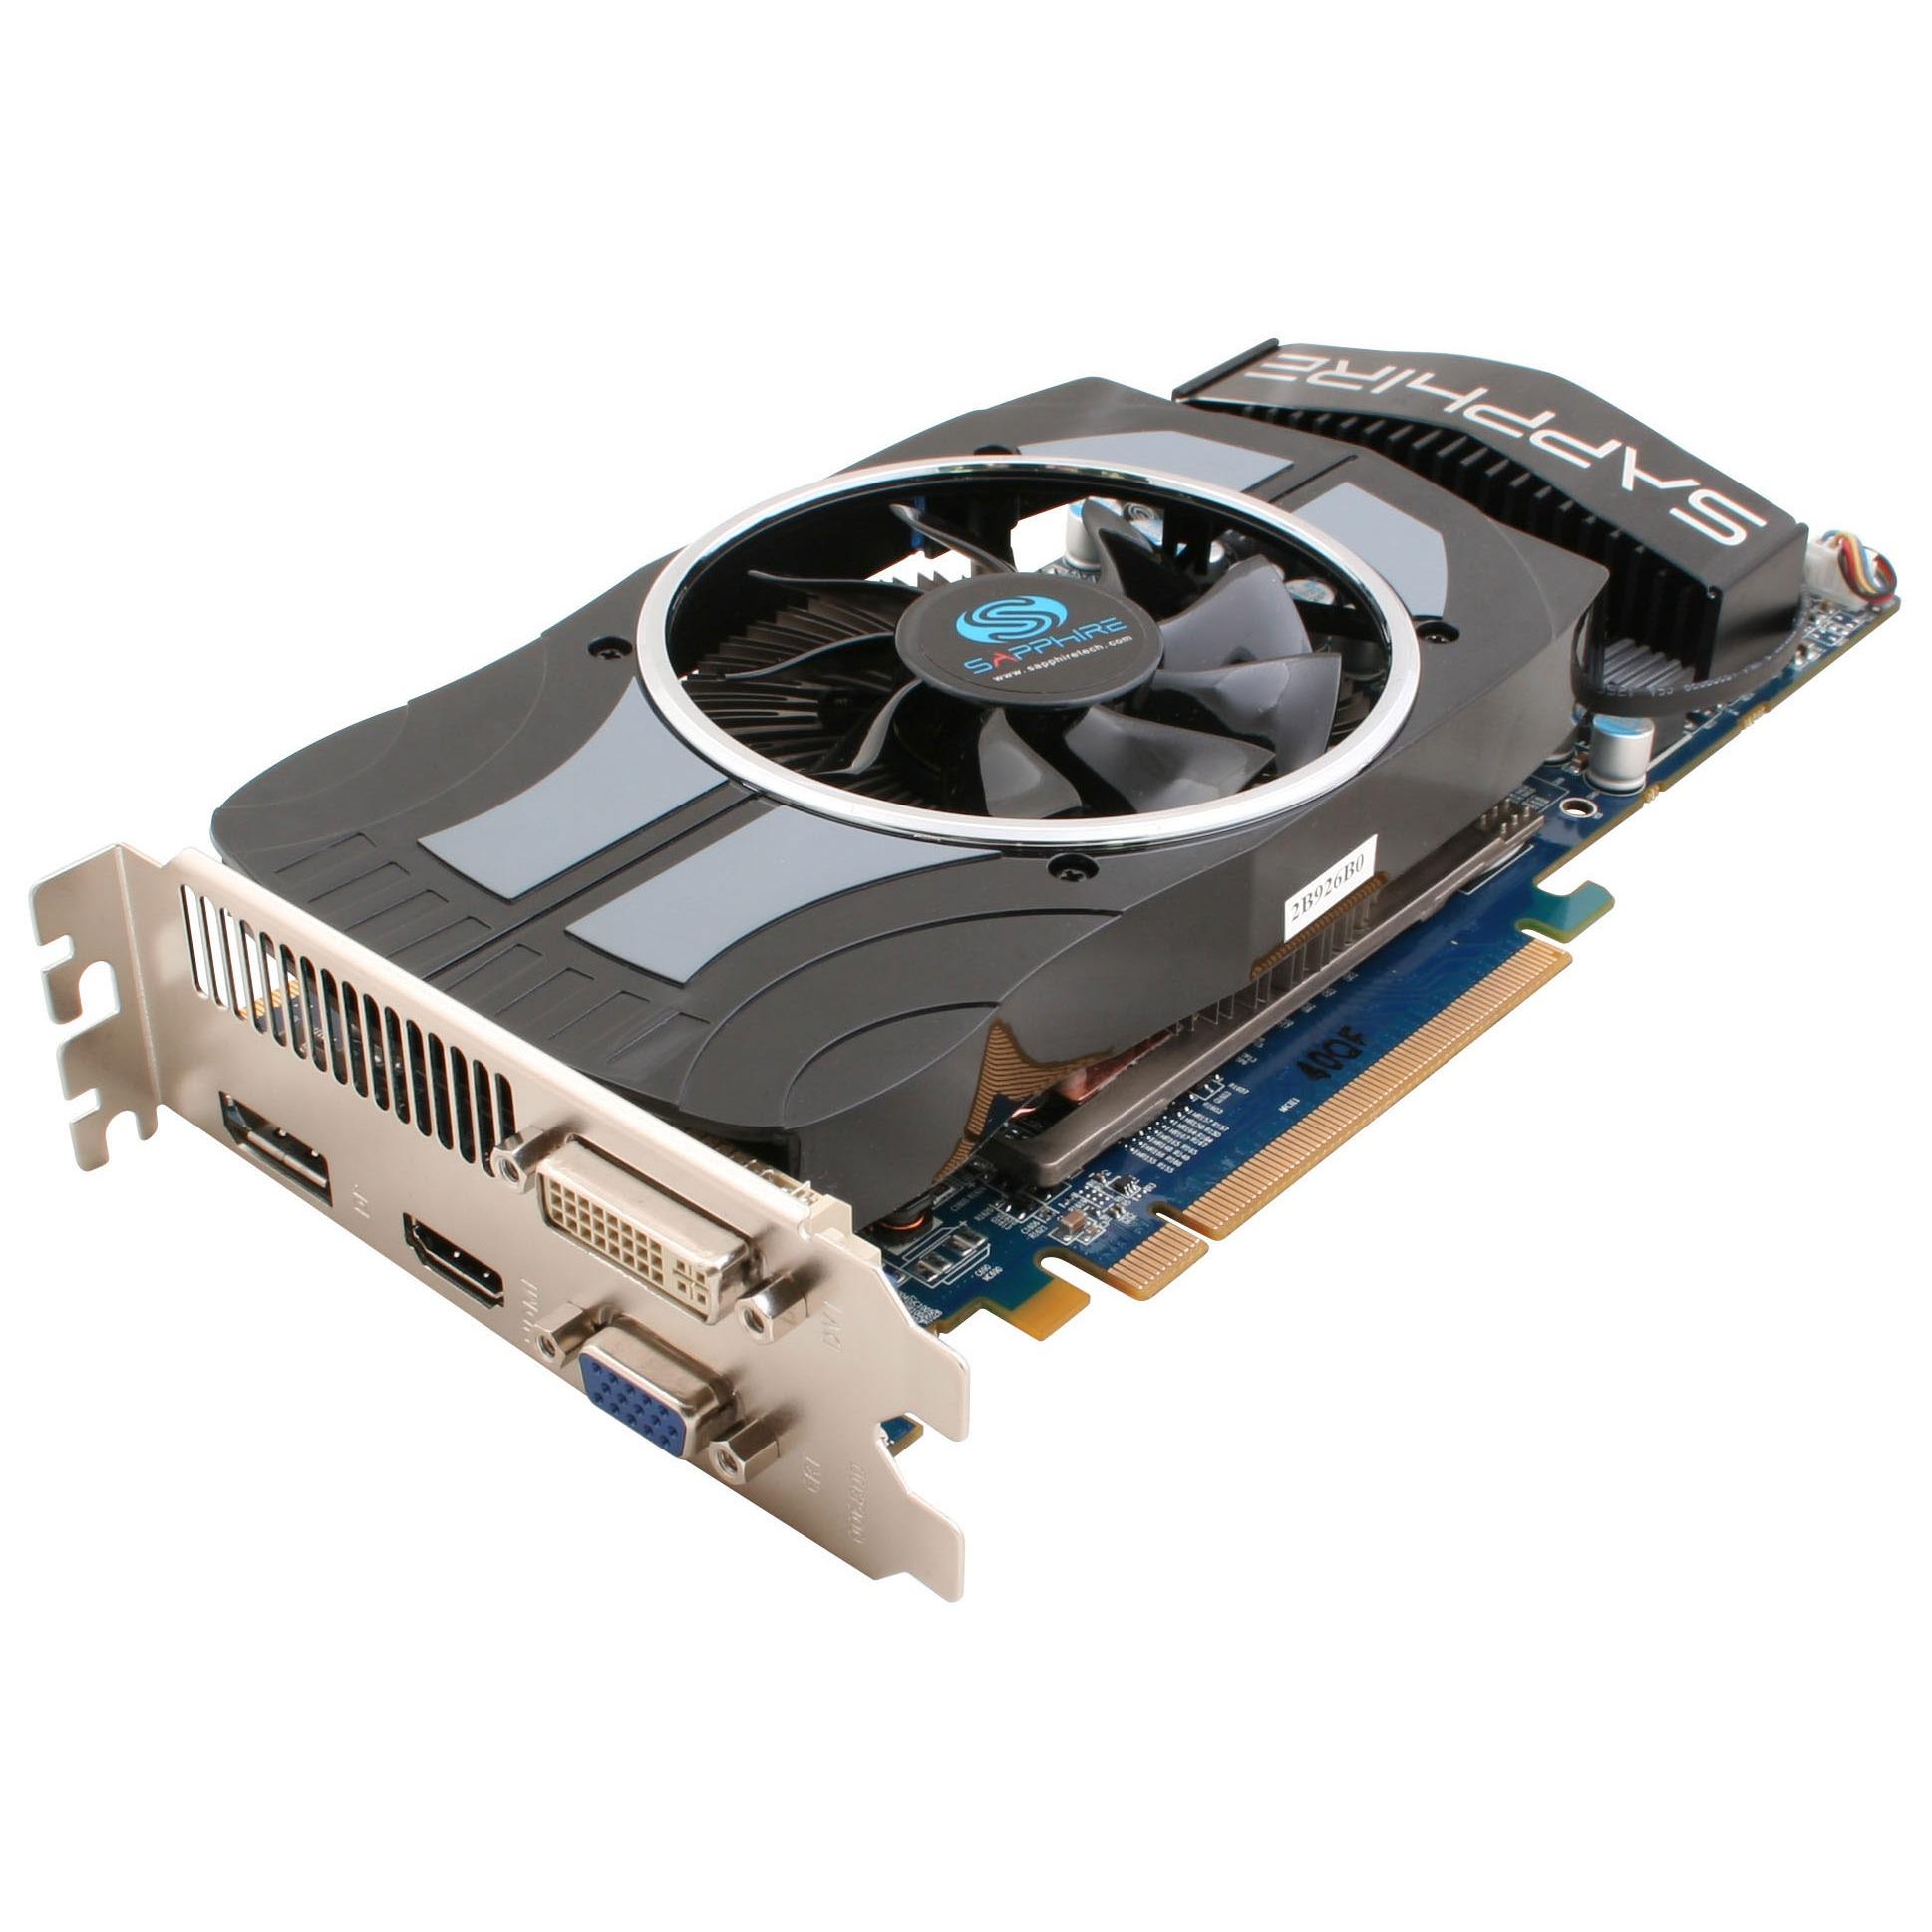 Carte graphique Sapphire VAPOR-X HD 4890 - 2 Go Sapphire VAPOR-X HD 4890 - 2 Go HDMI/DVI/DisplayPort - PCI Express (ATI Radeon HD 4890)